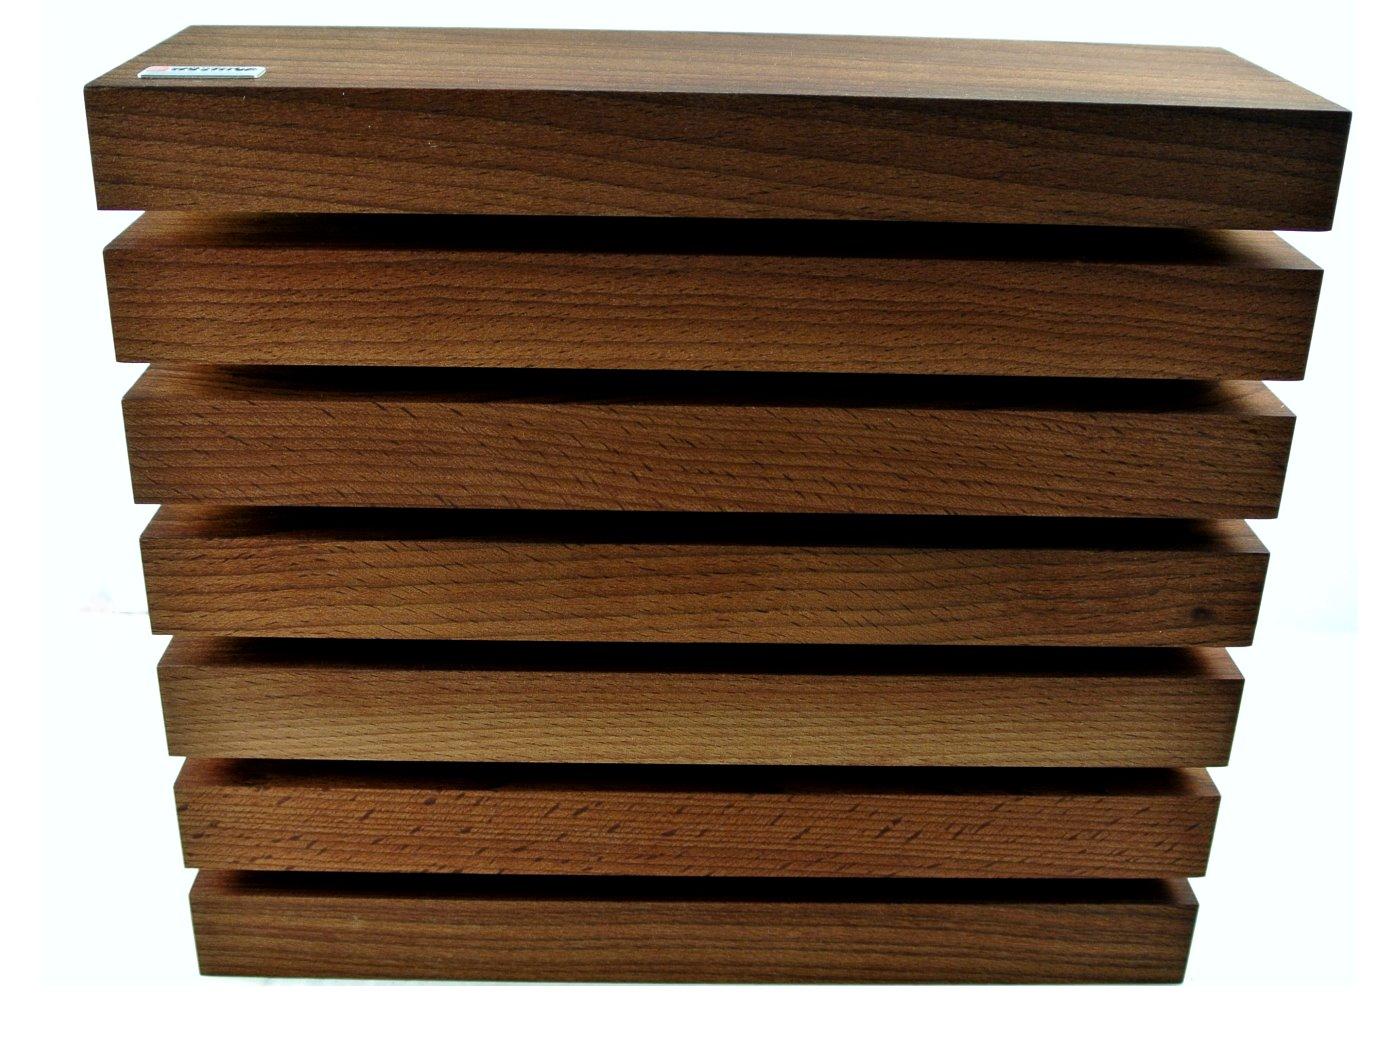 w sthof messerblock magnetisch thermobuche 6 messer messerkontor. Black Bedroom Furniture Sets. Home Design Ideas